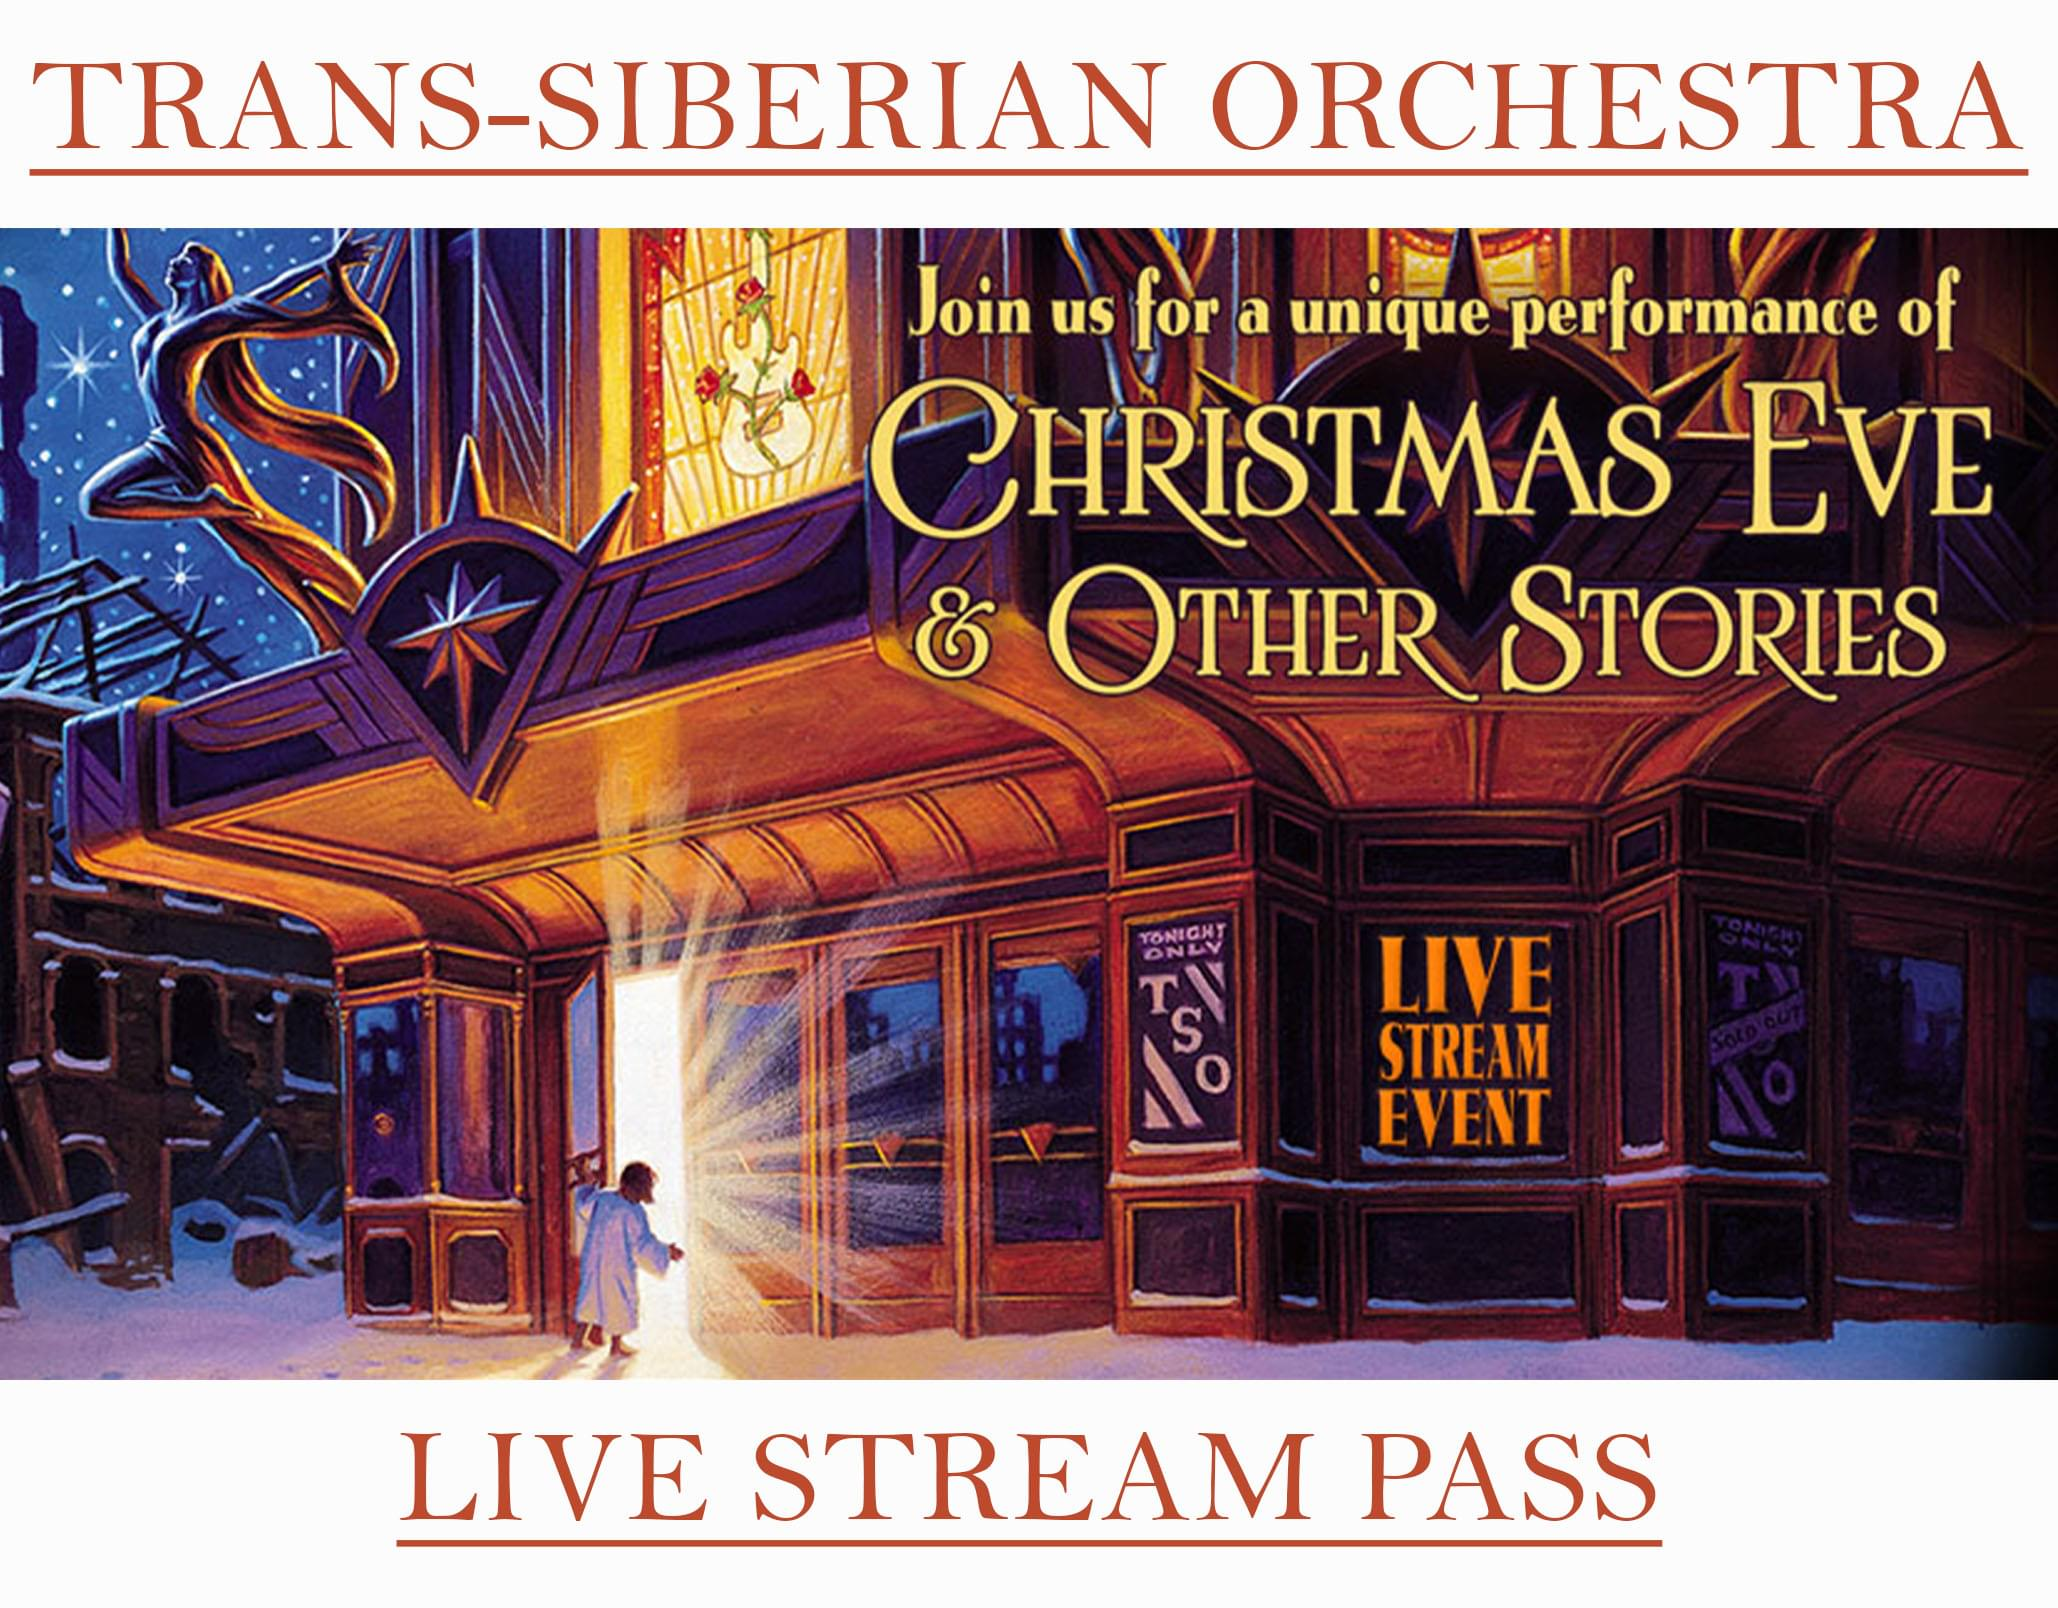 Trans-Siberian Orchestra Live Stream Event!